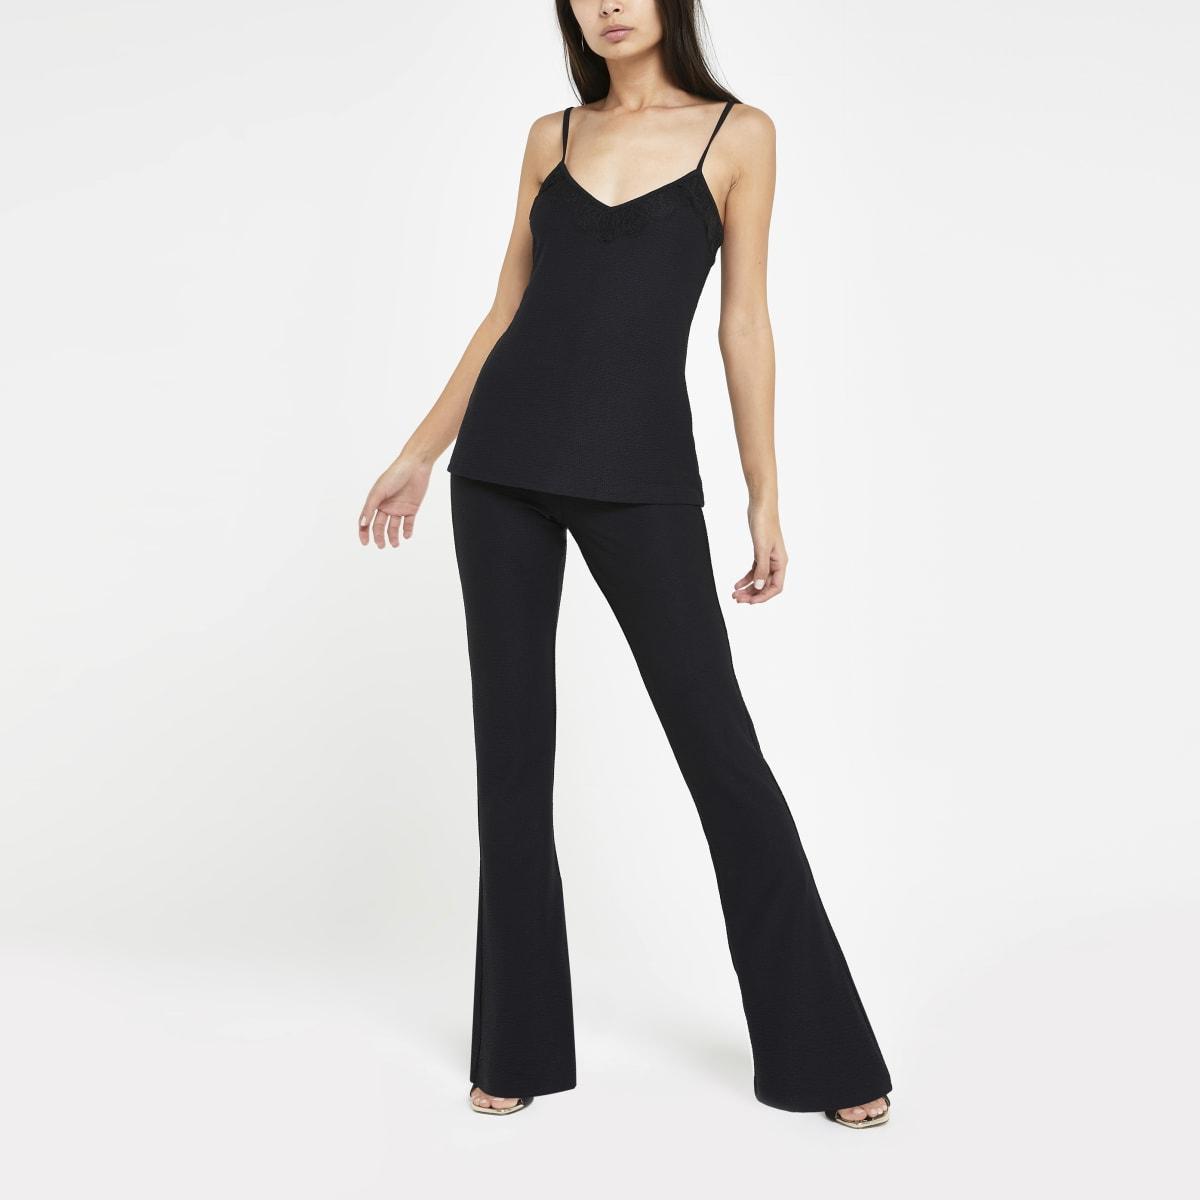 Black high waist jersey flare trousers